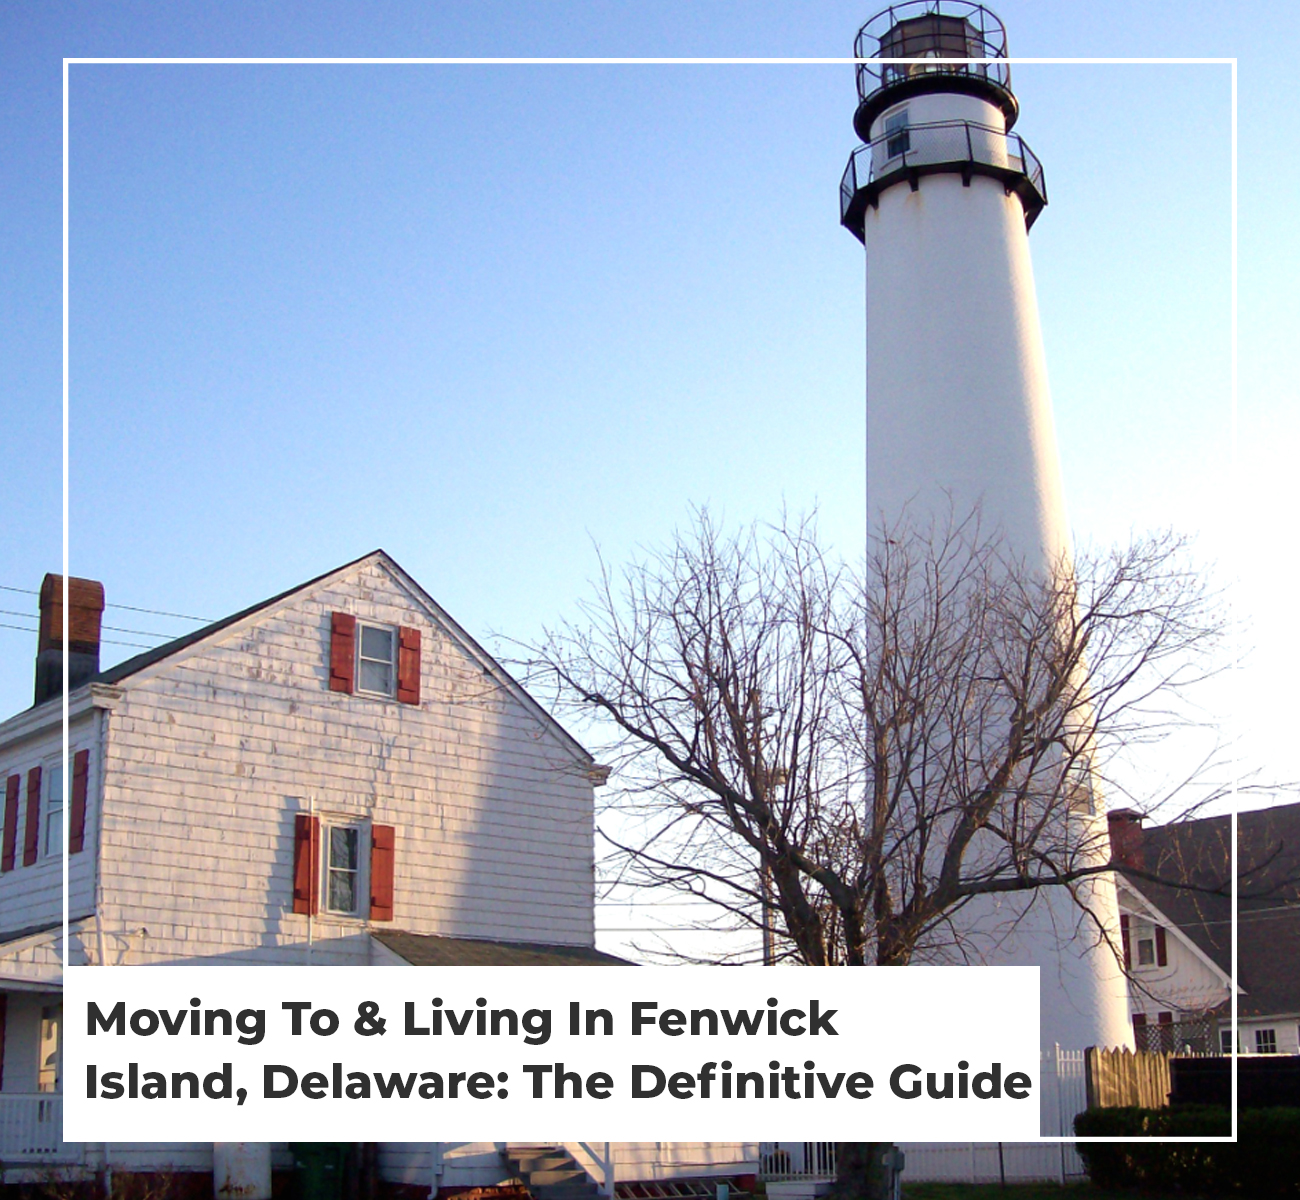 Moving To Fenwick Island